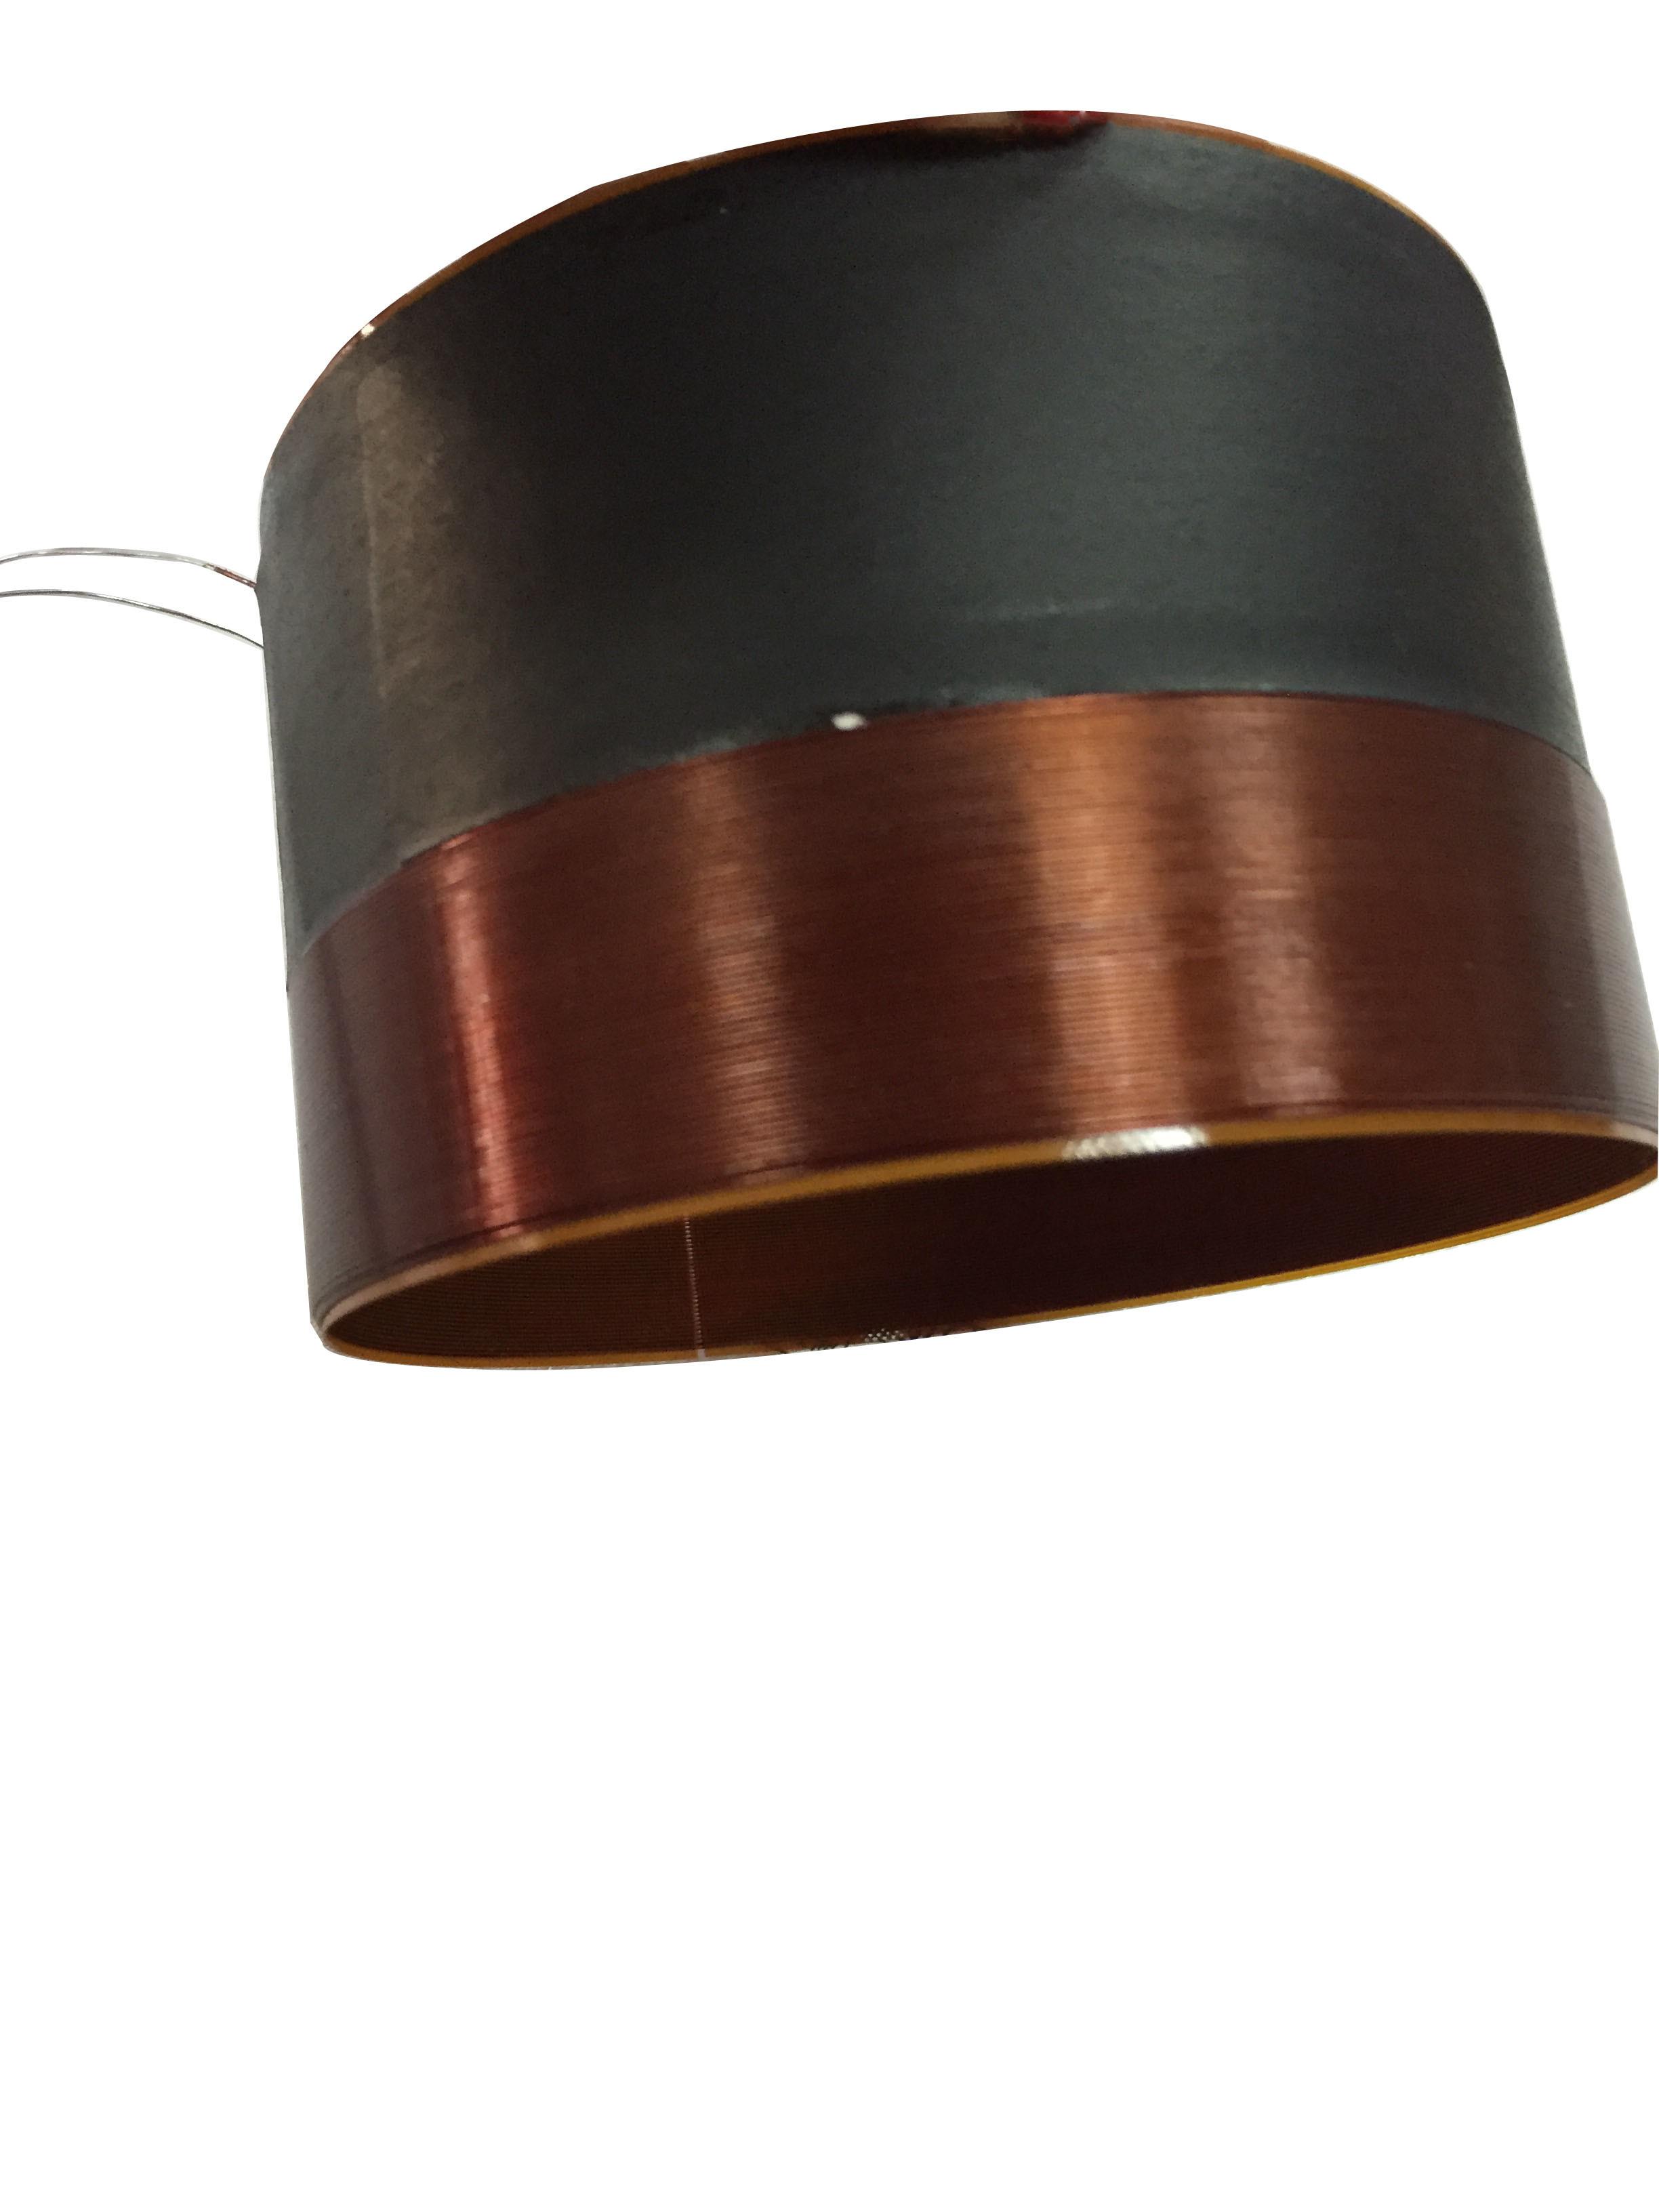 Speaker Parts Ksv Voice Coil - Loundspeaker Voice Coil